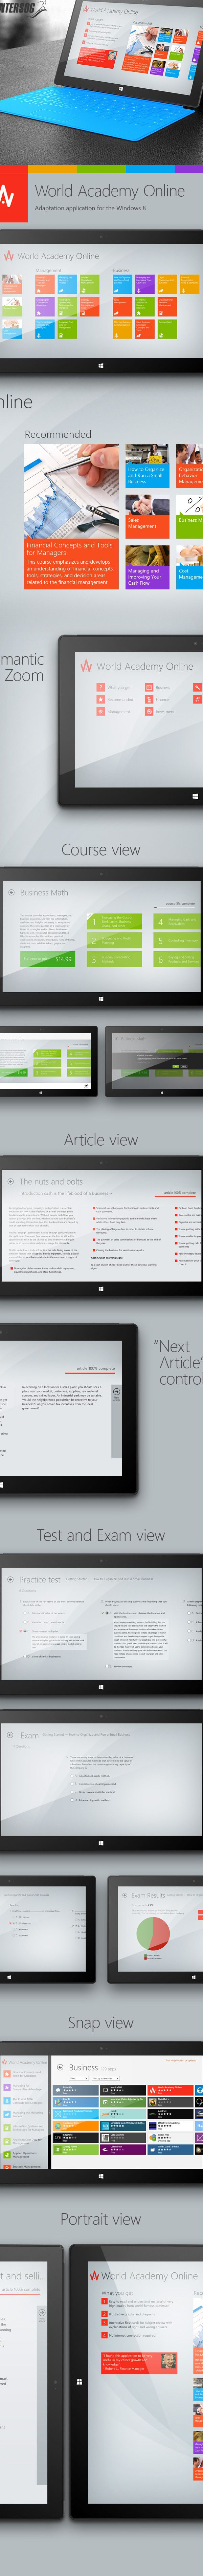 World Academy Online for Windows 8 on Behance